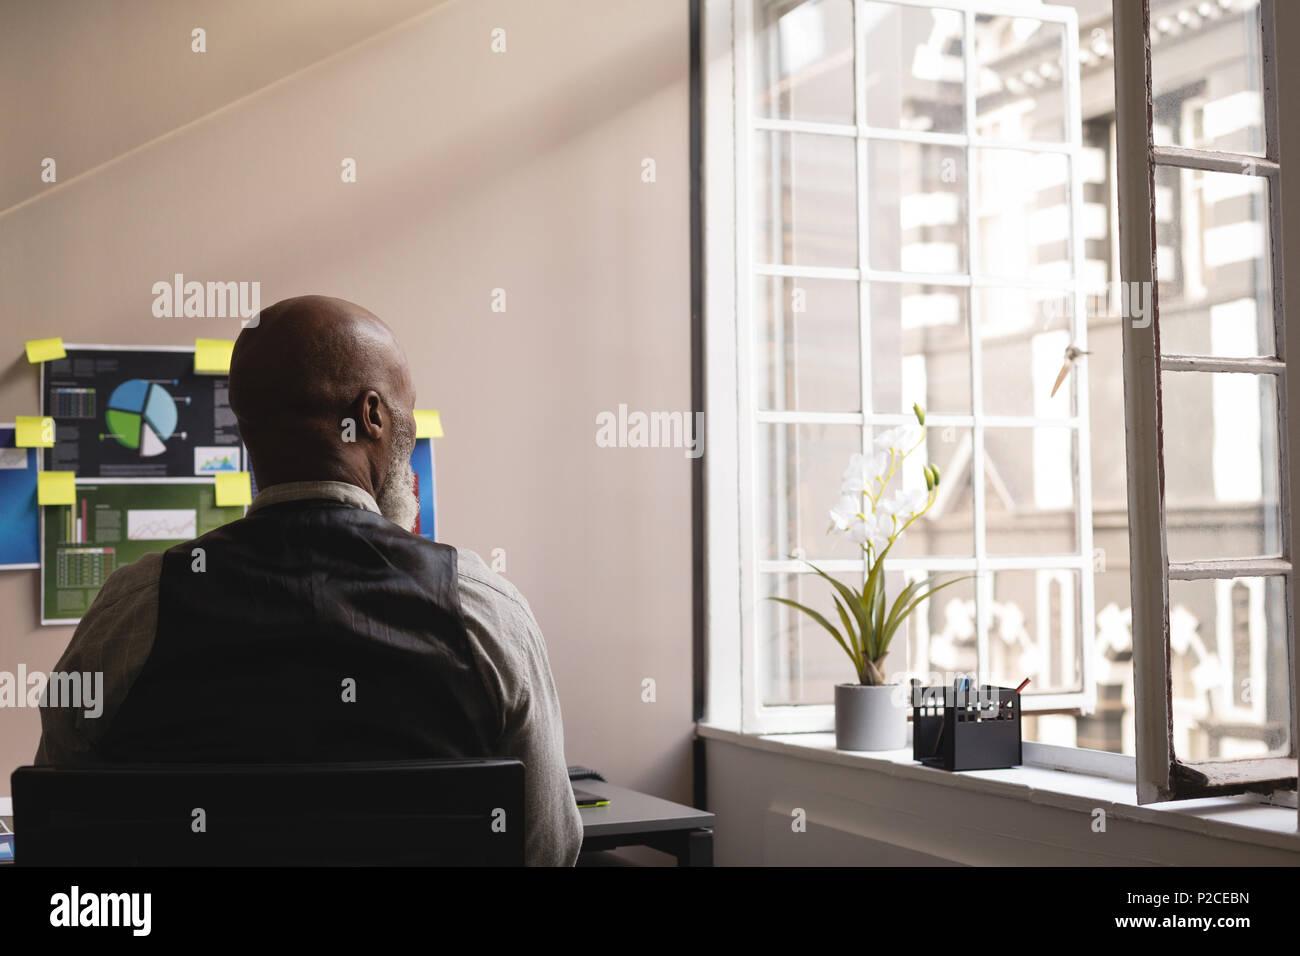 Senior graphic designer relaxing in office - Stock Image